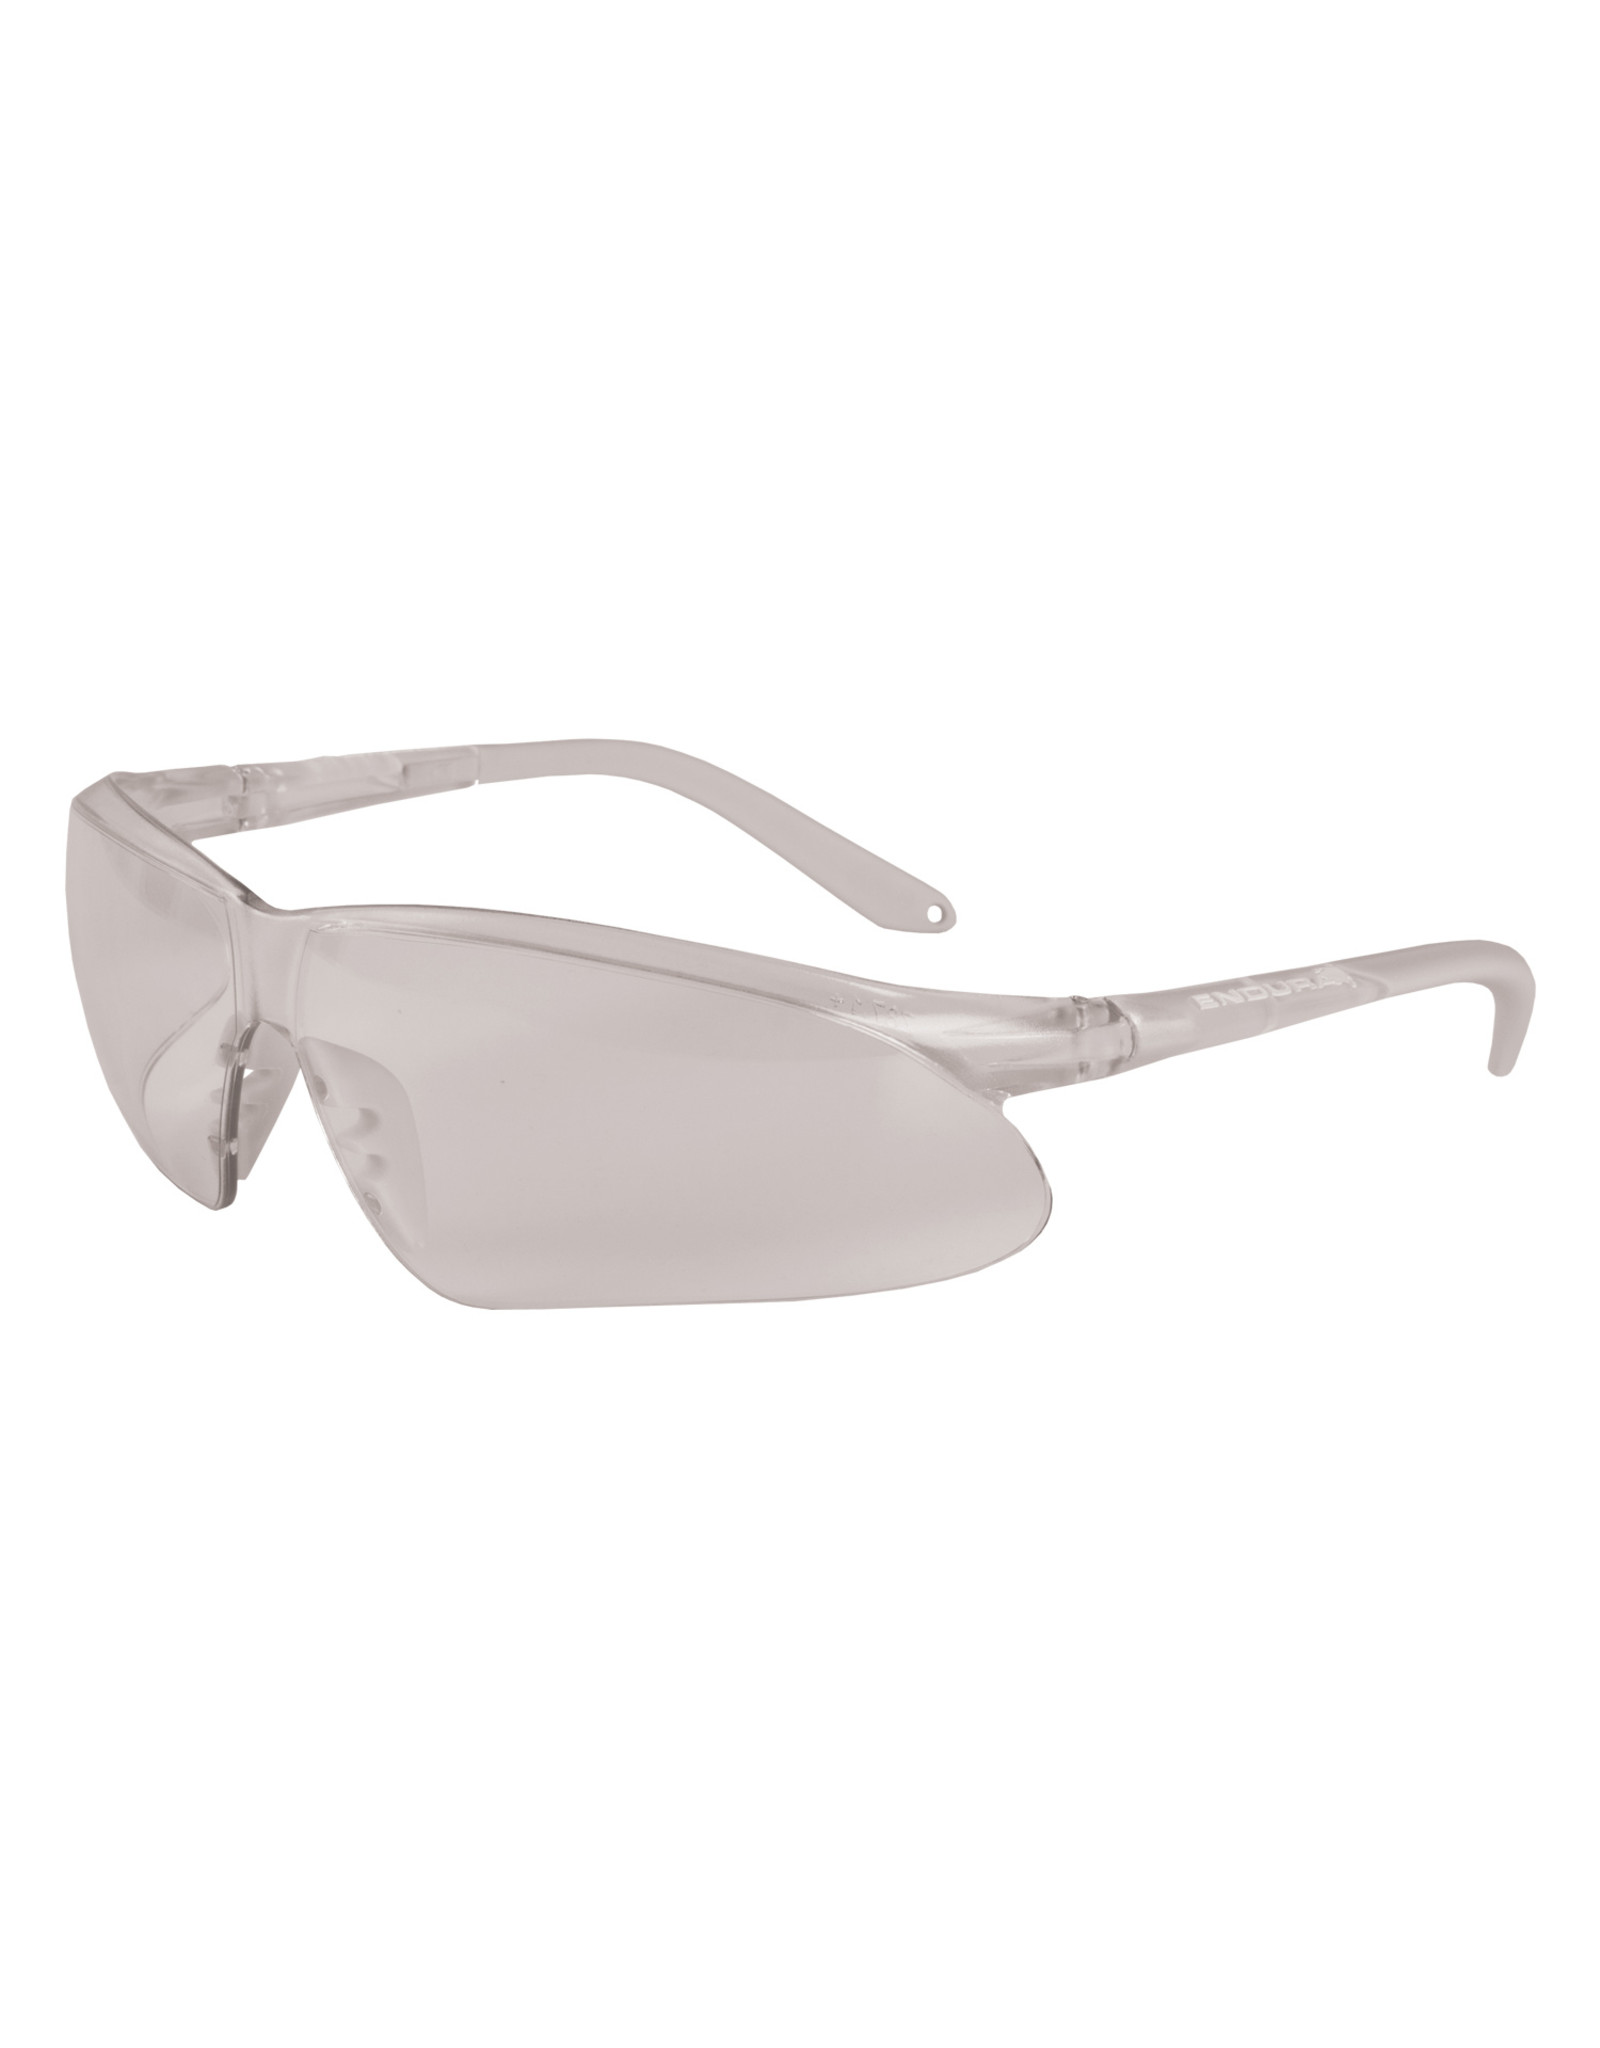 Endura Endura Glasses Spectral: Transparent - One size